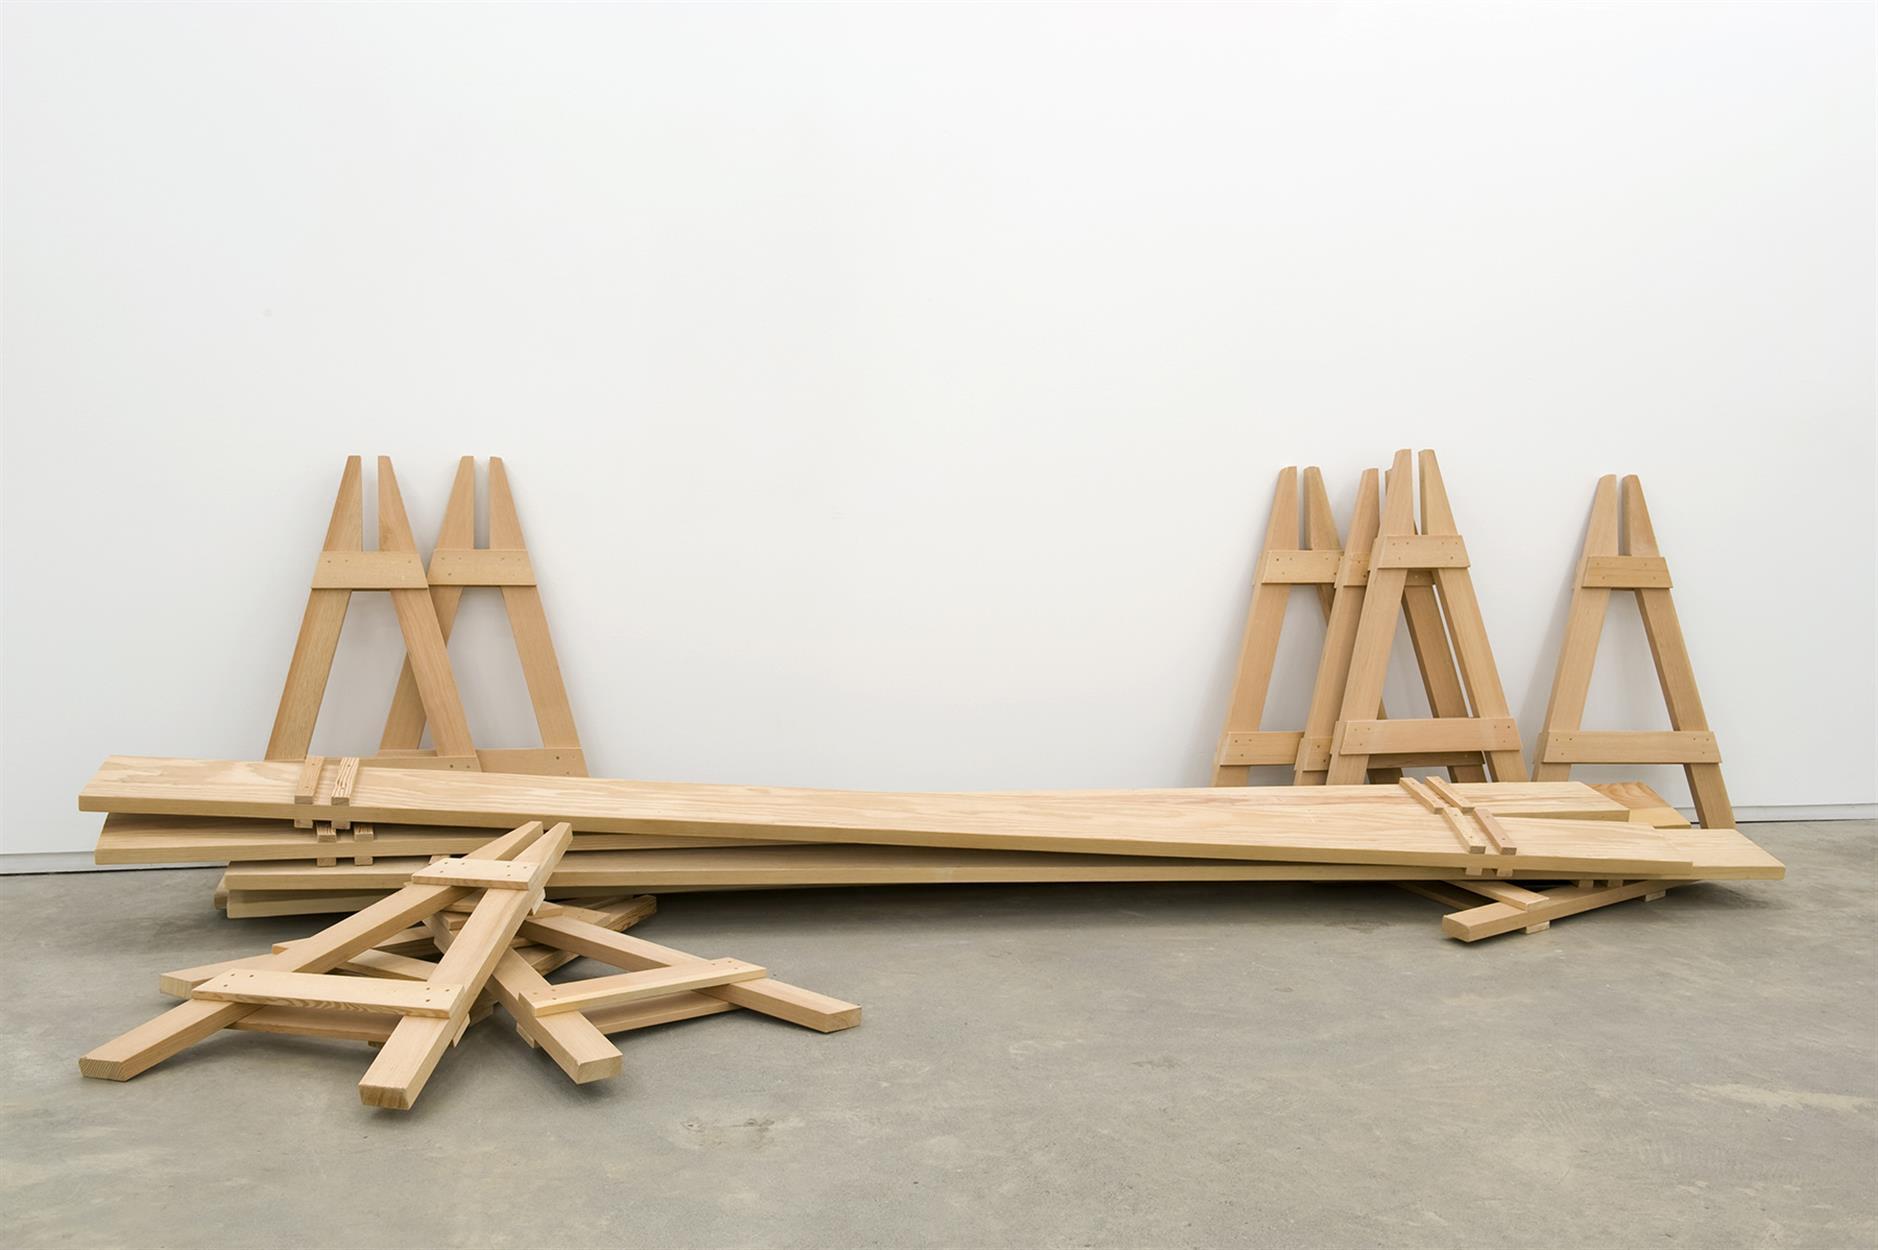 Brian Jungen,  Barricades , 2010 Fir, 5 parts, each 41 x 26 x 144 inches (104 x 66 x 366 cm). Courtesy Catriona Jeffries.